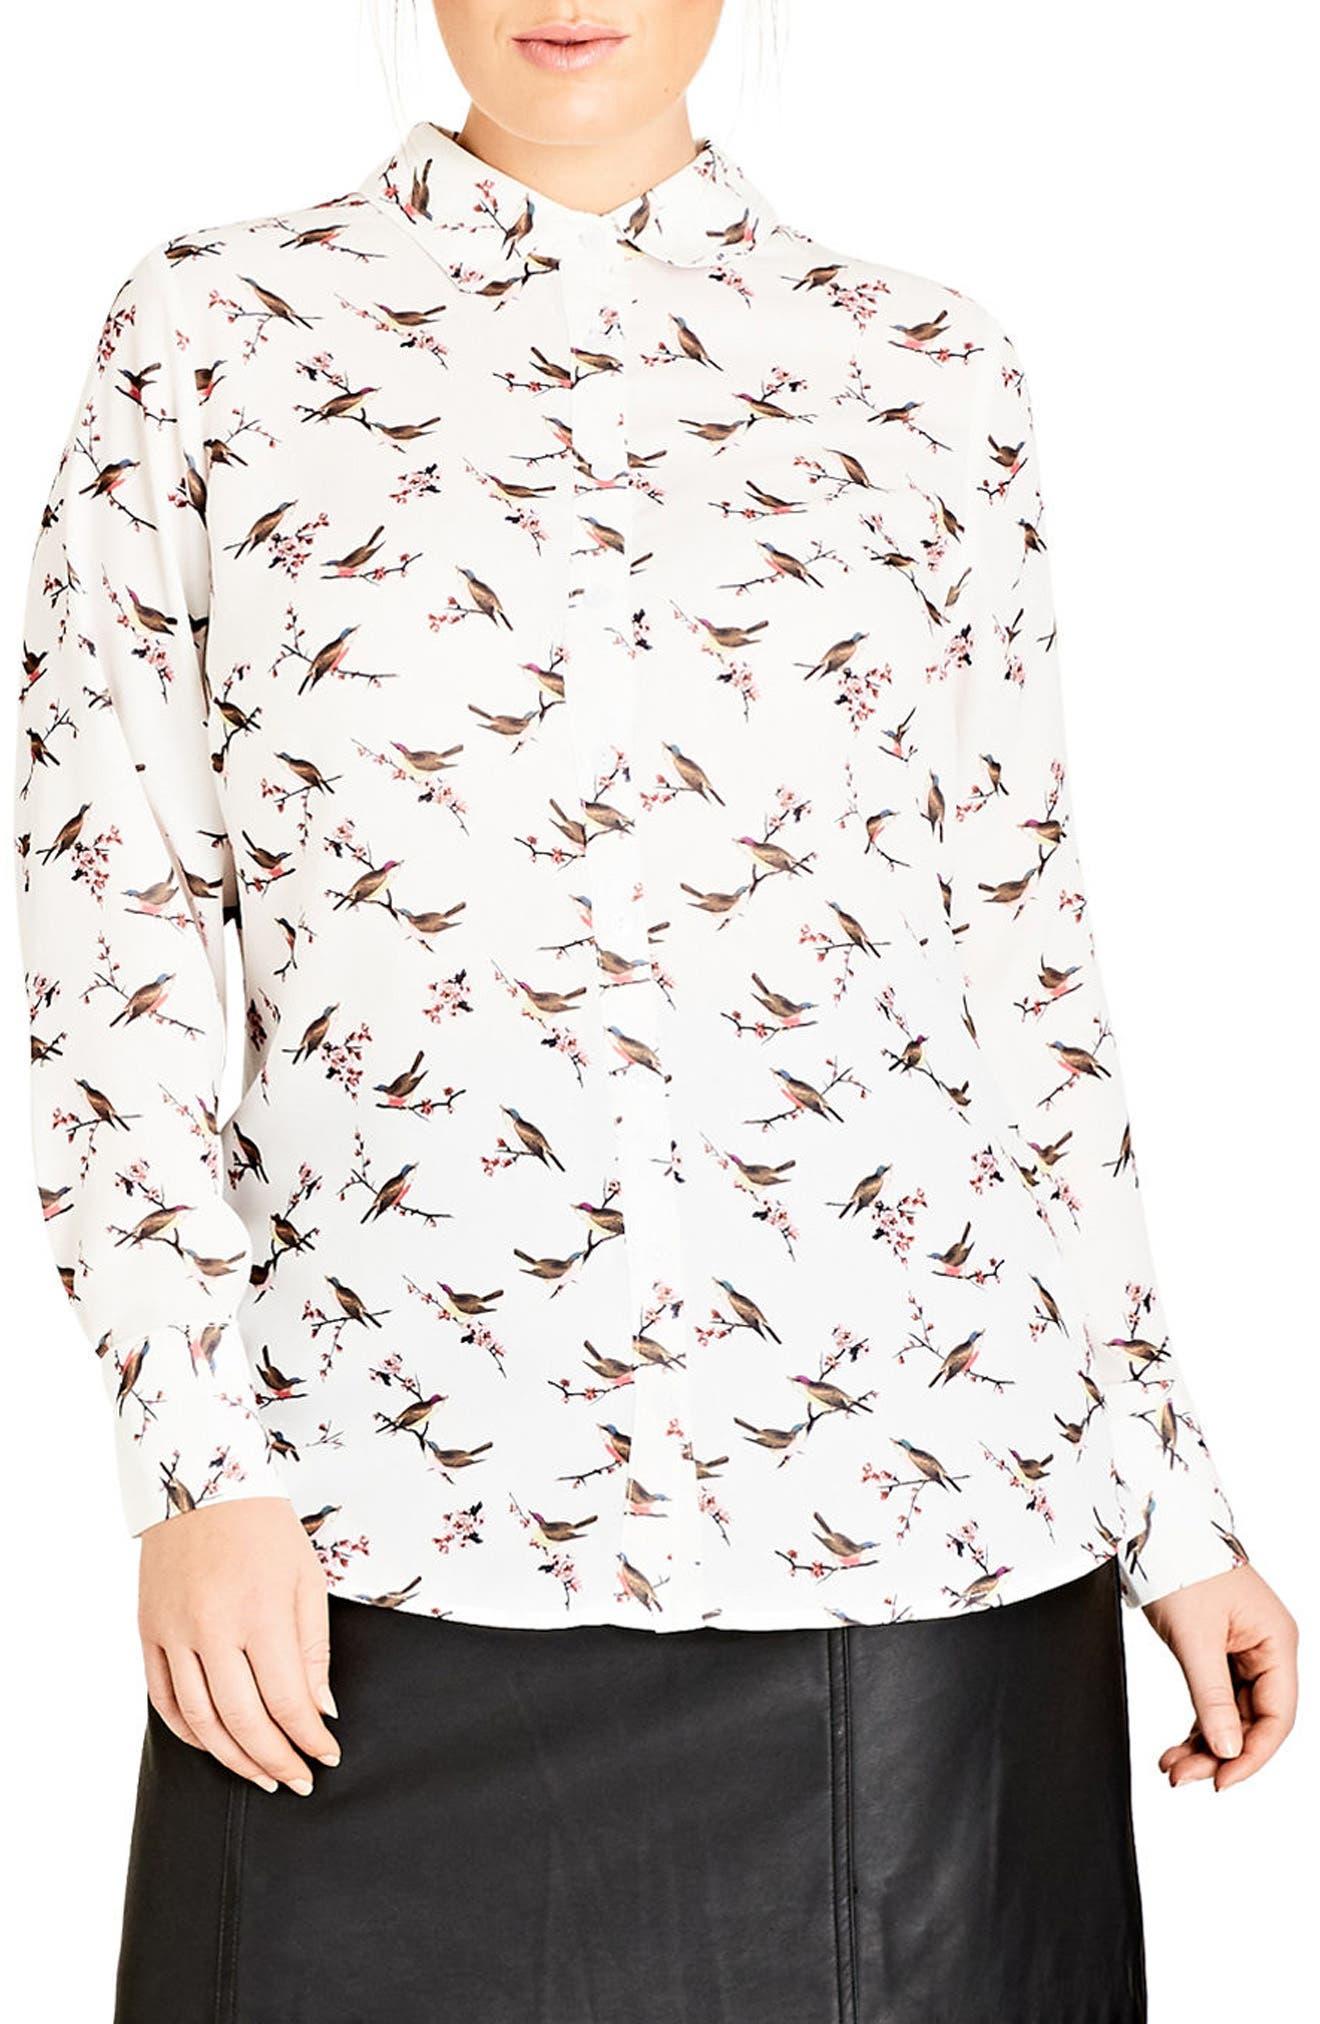 Birdy Shirt,                             Main thumbnail 1, color,                             Birdy